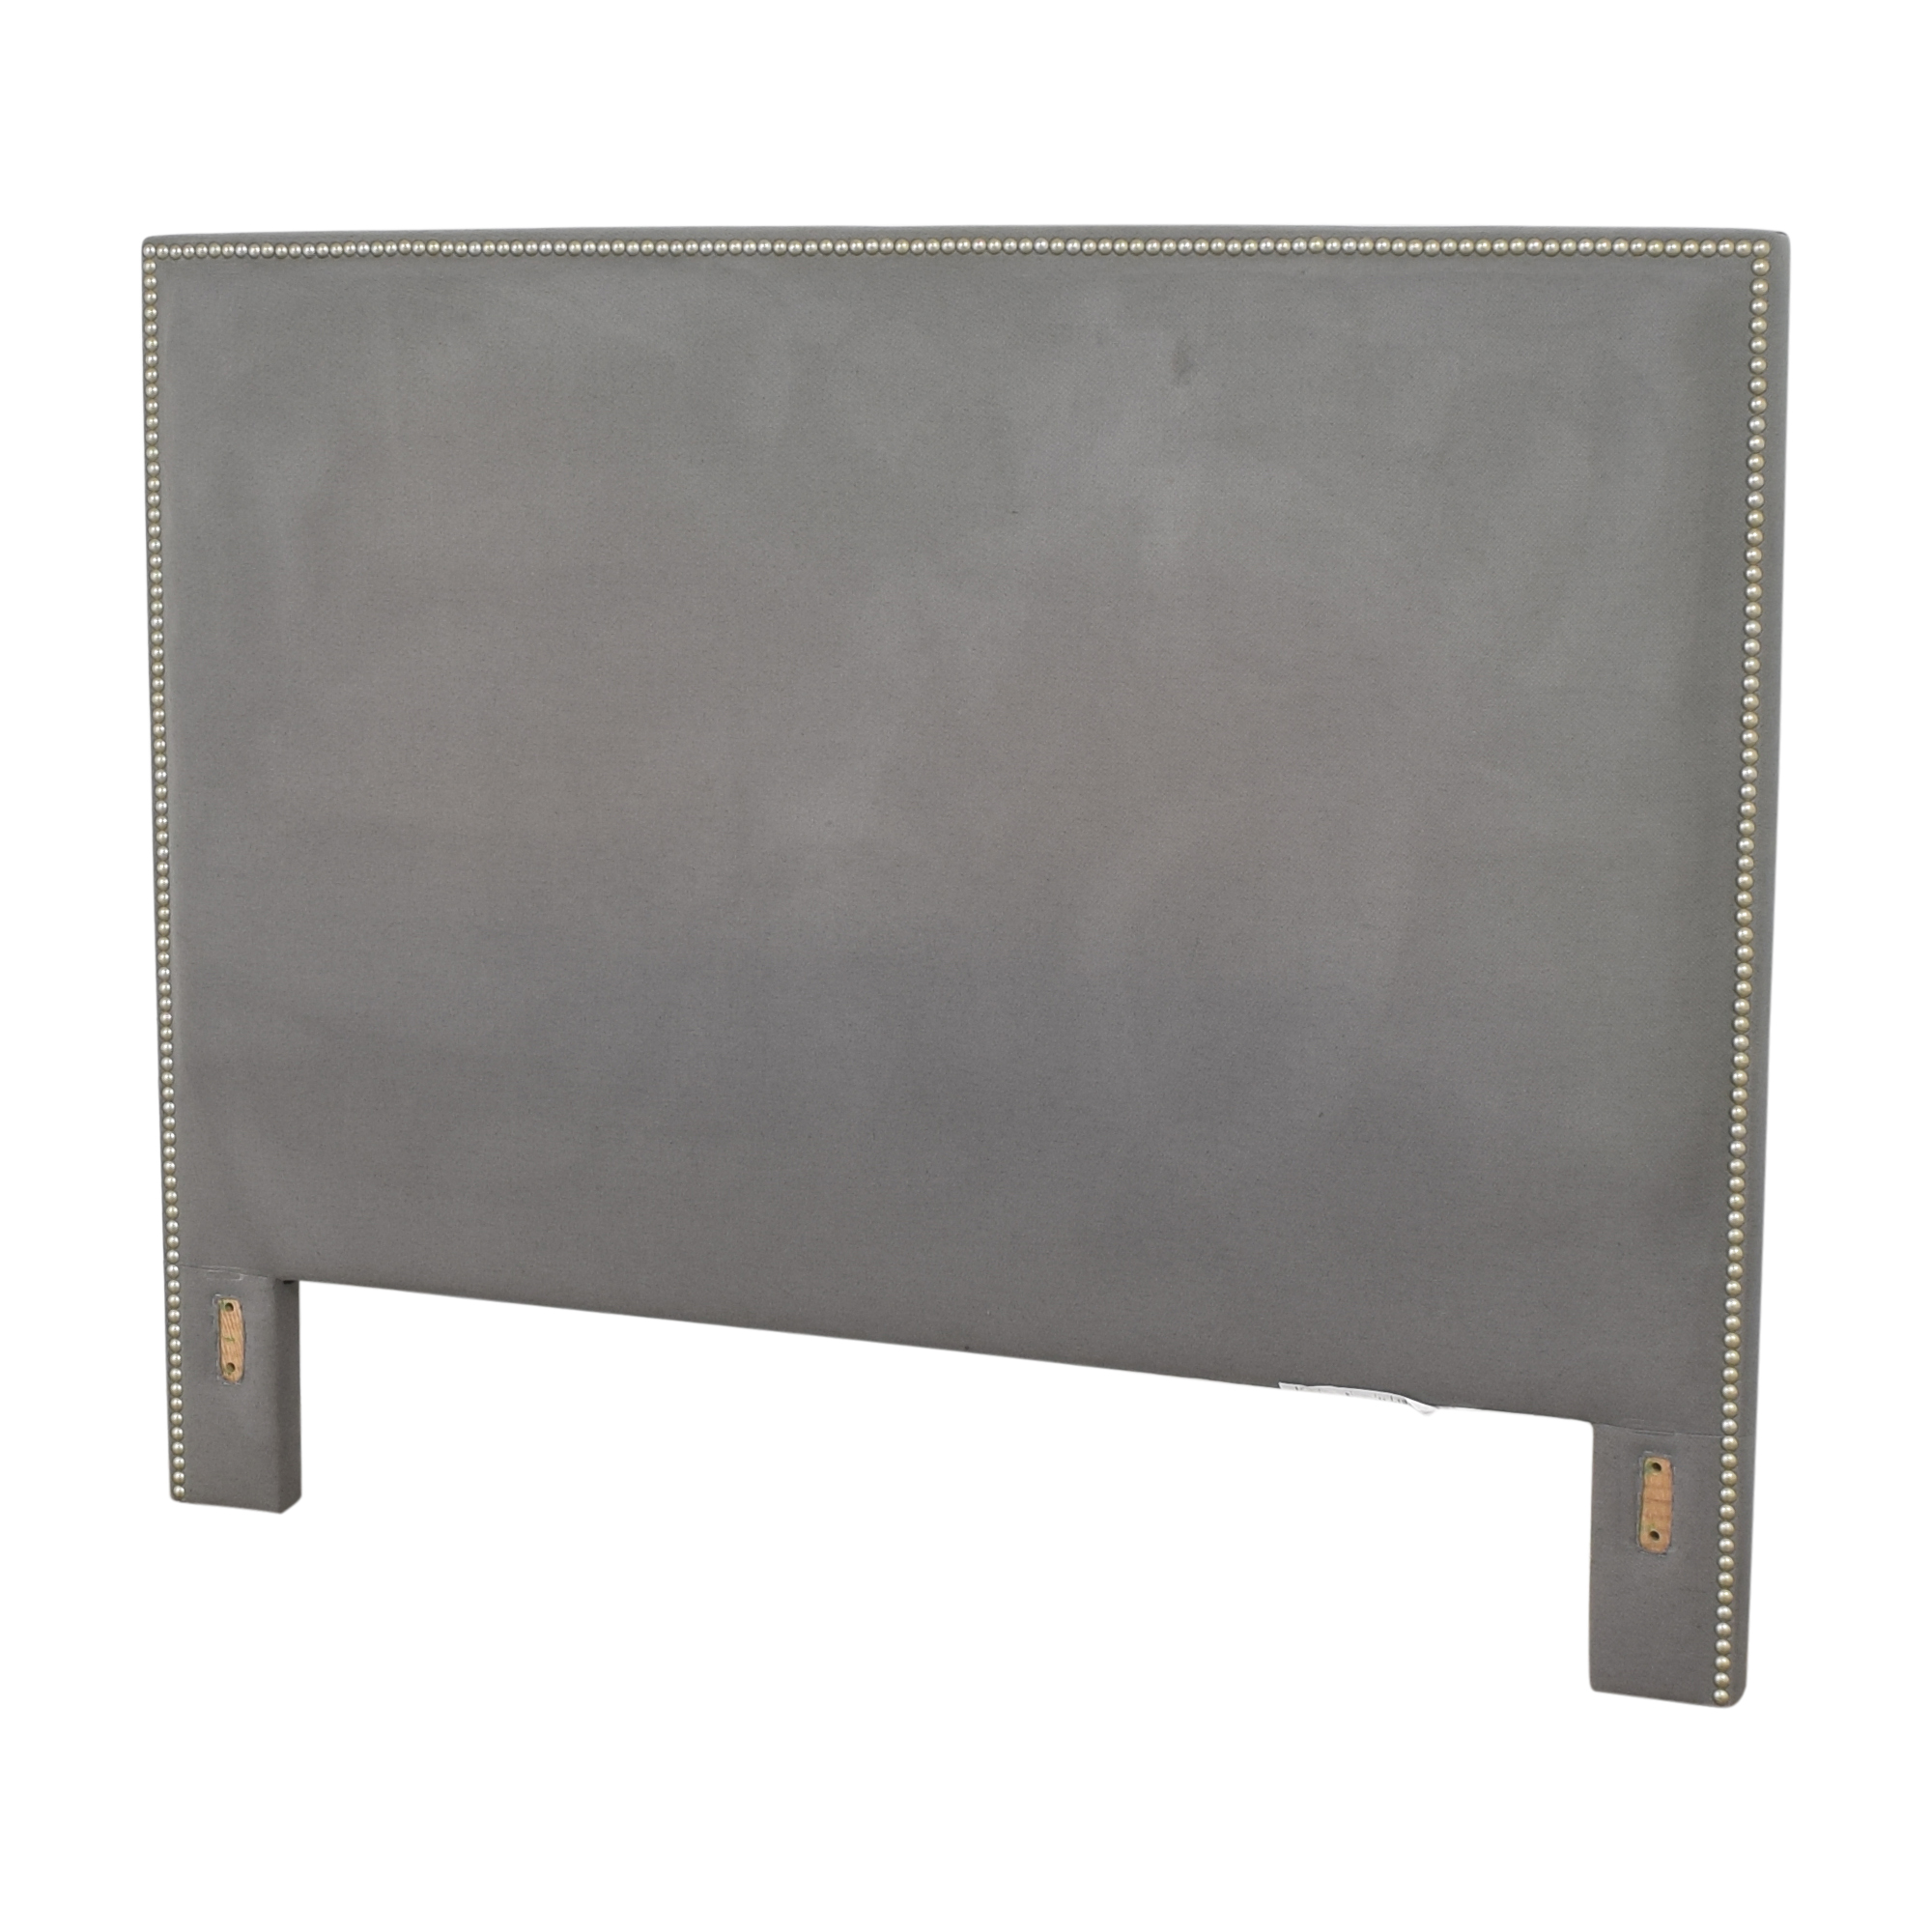 Crate & Barrel Crate & Barrel Cole Upholstered Queen Headboard pa